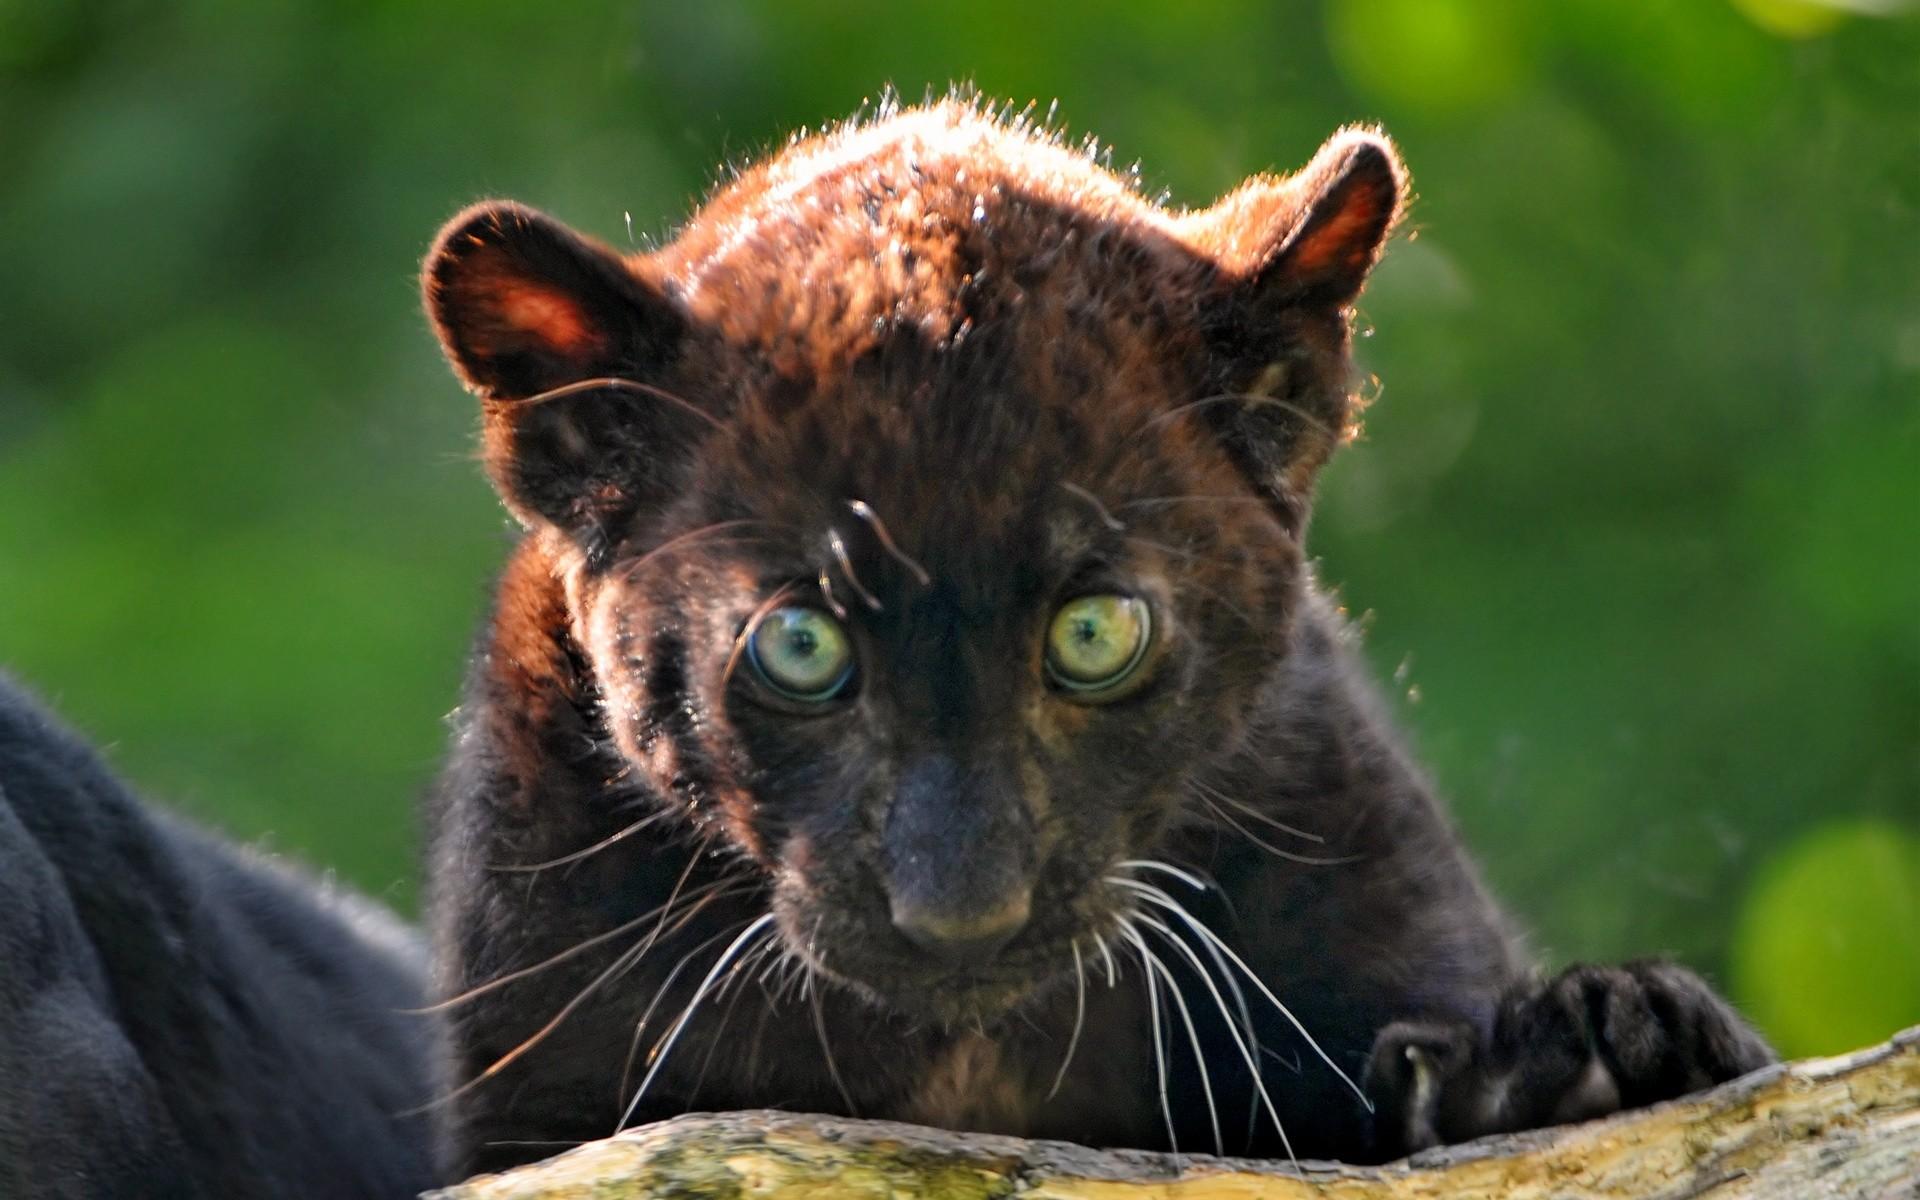 Black Panther Blue Eyes Wallpaper (60+ images) - photo#30